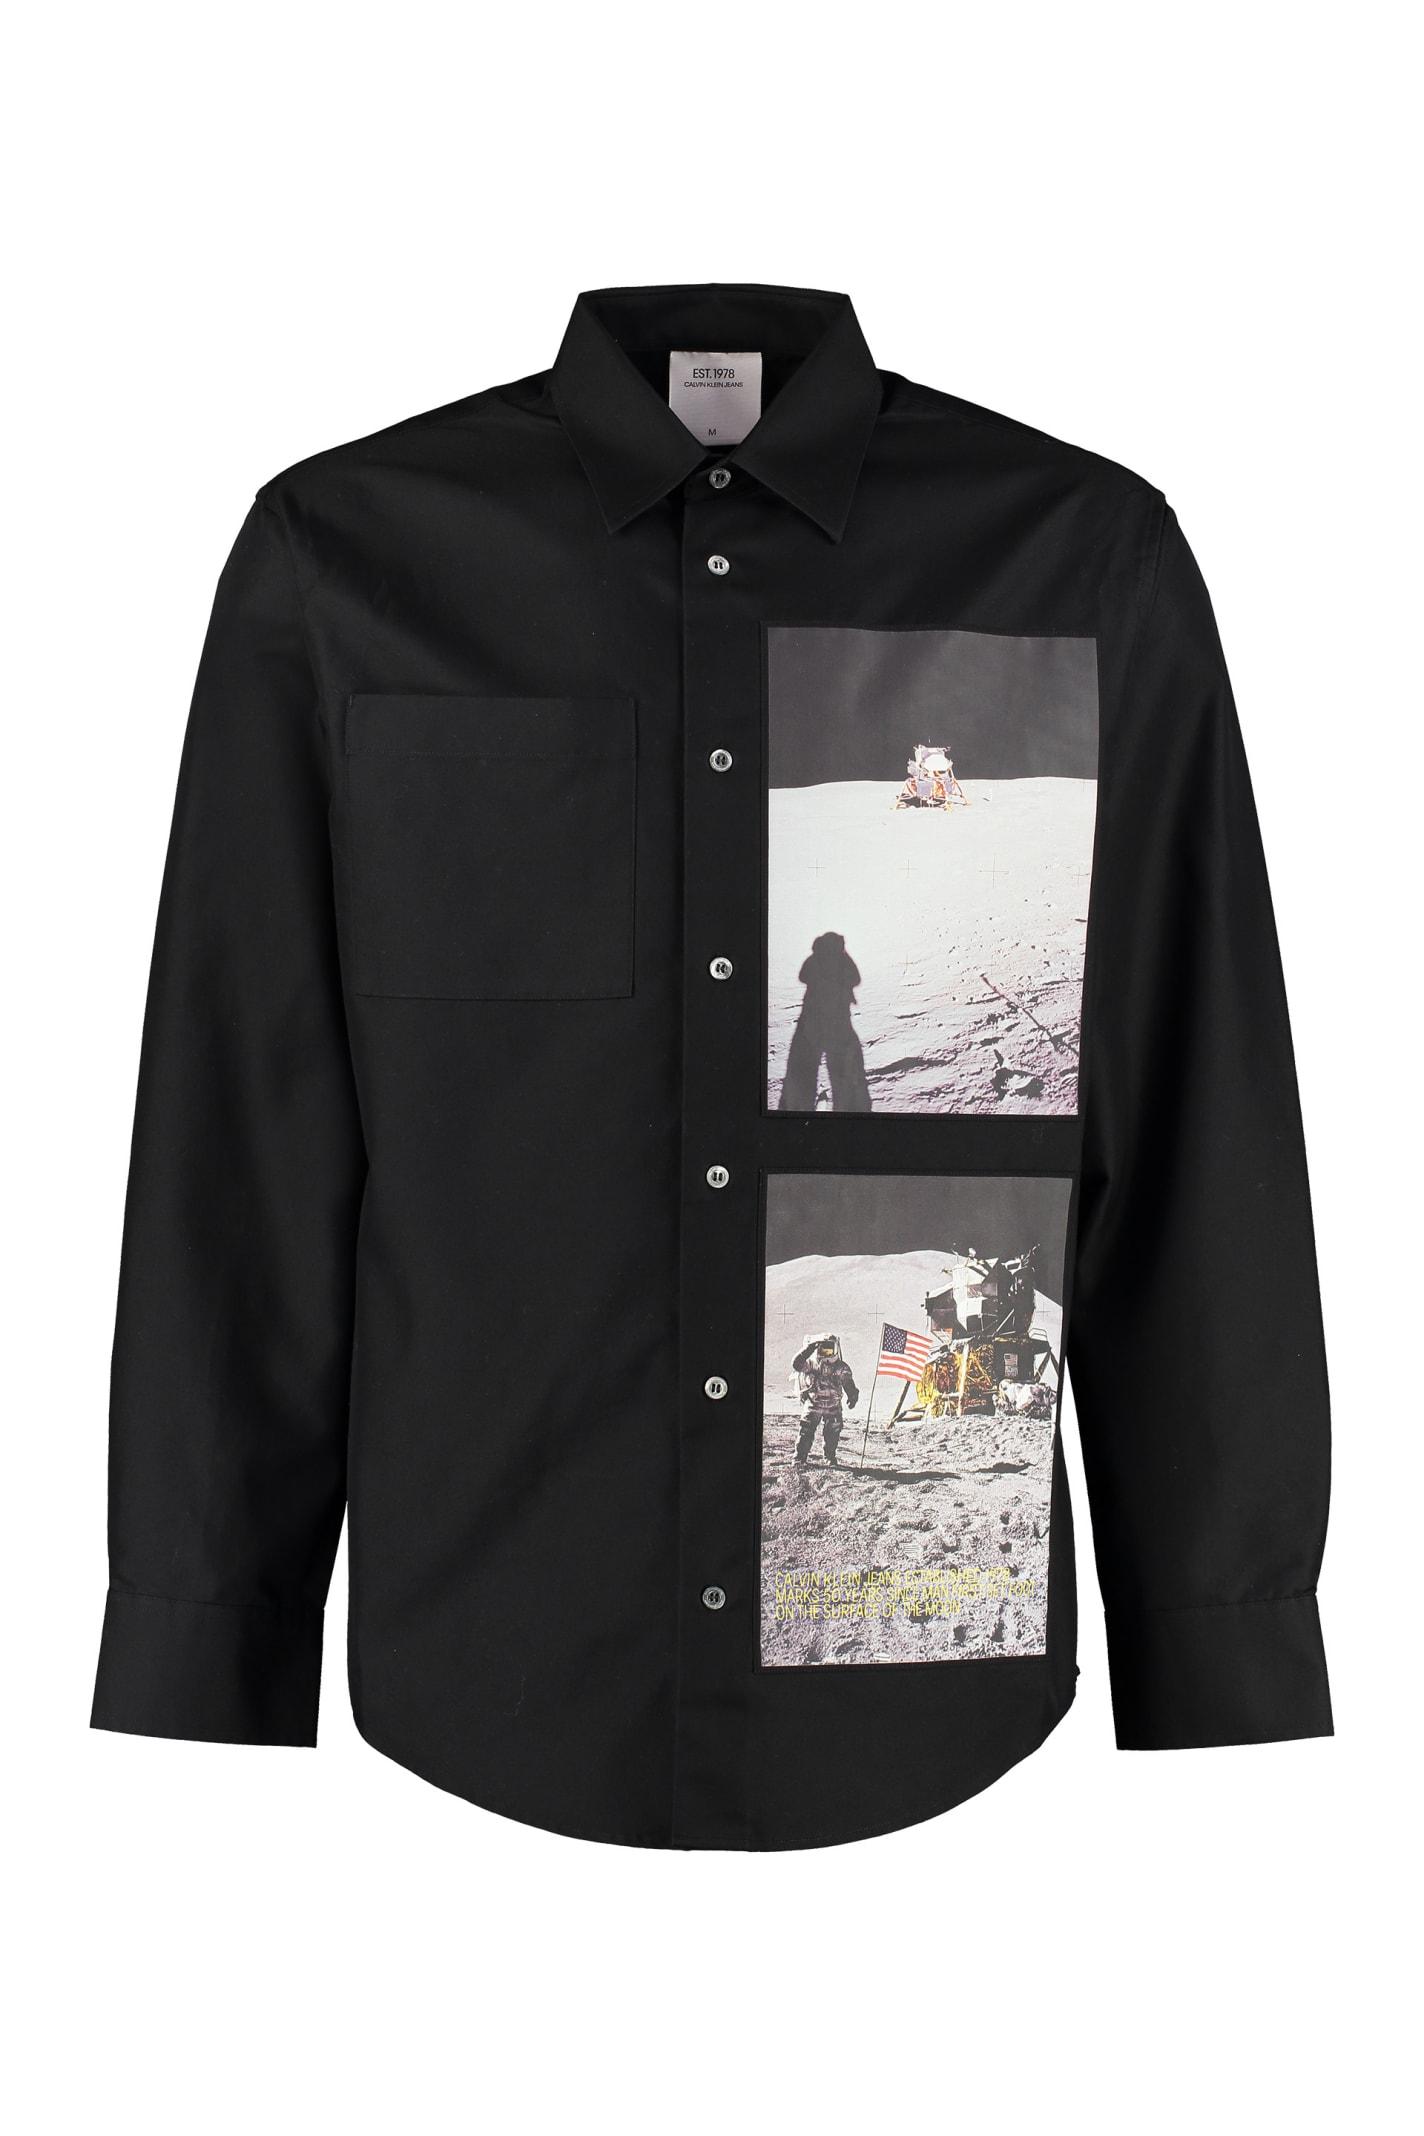 Calvin Klein Jeans Cotton Blend Long Sleeves Shirt